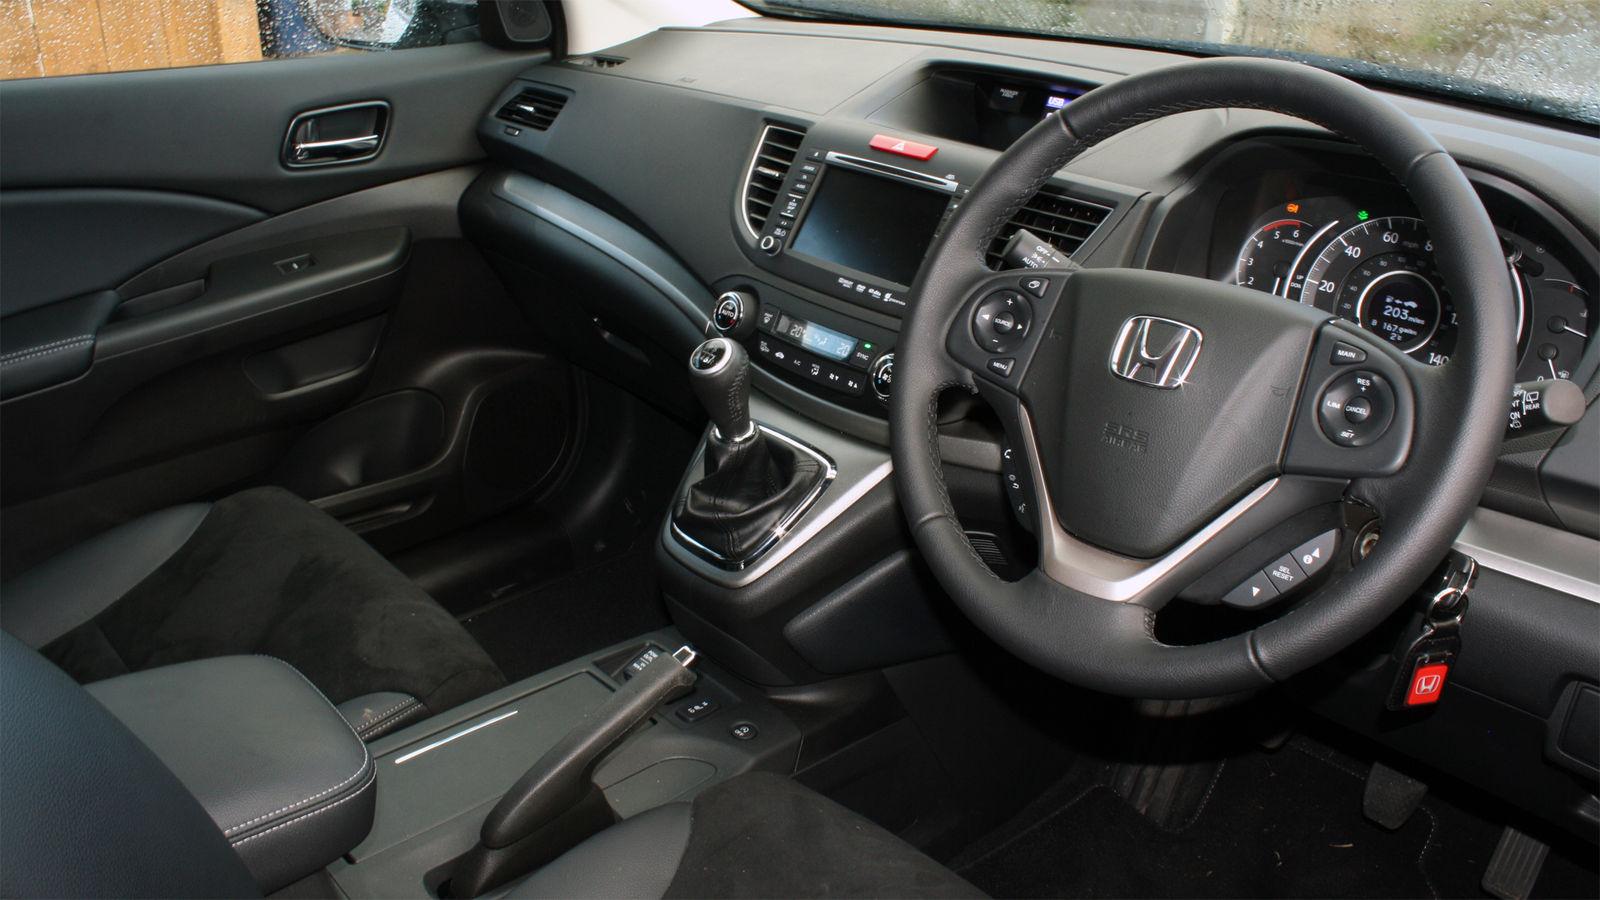 ... crv interior storage dimensions. Honda CR V 16 DTEC Earth Dreams Real World UK Review